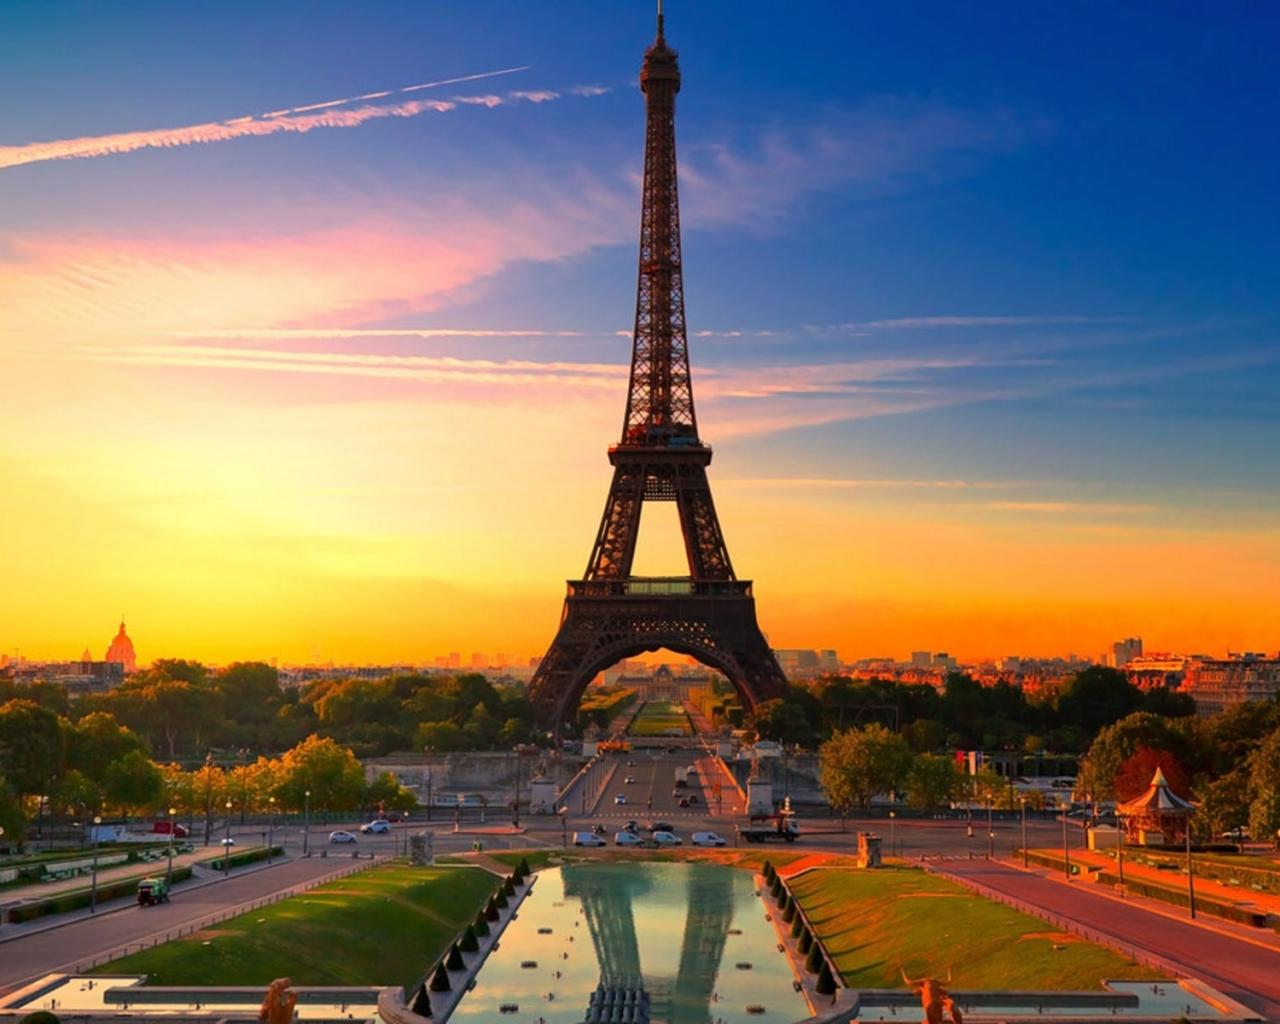 La torre Eiffel al atardecer - 1280x1024